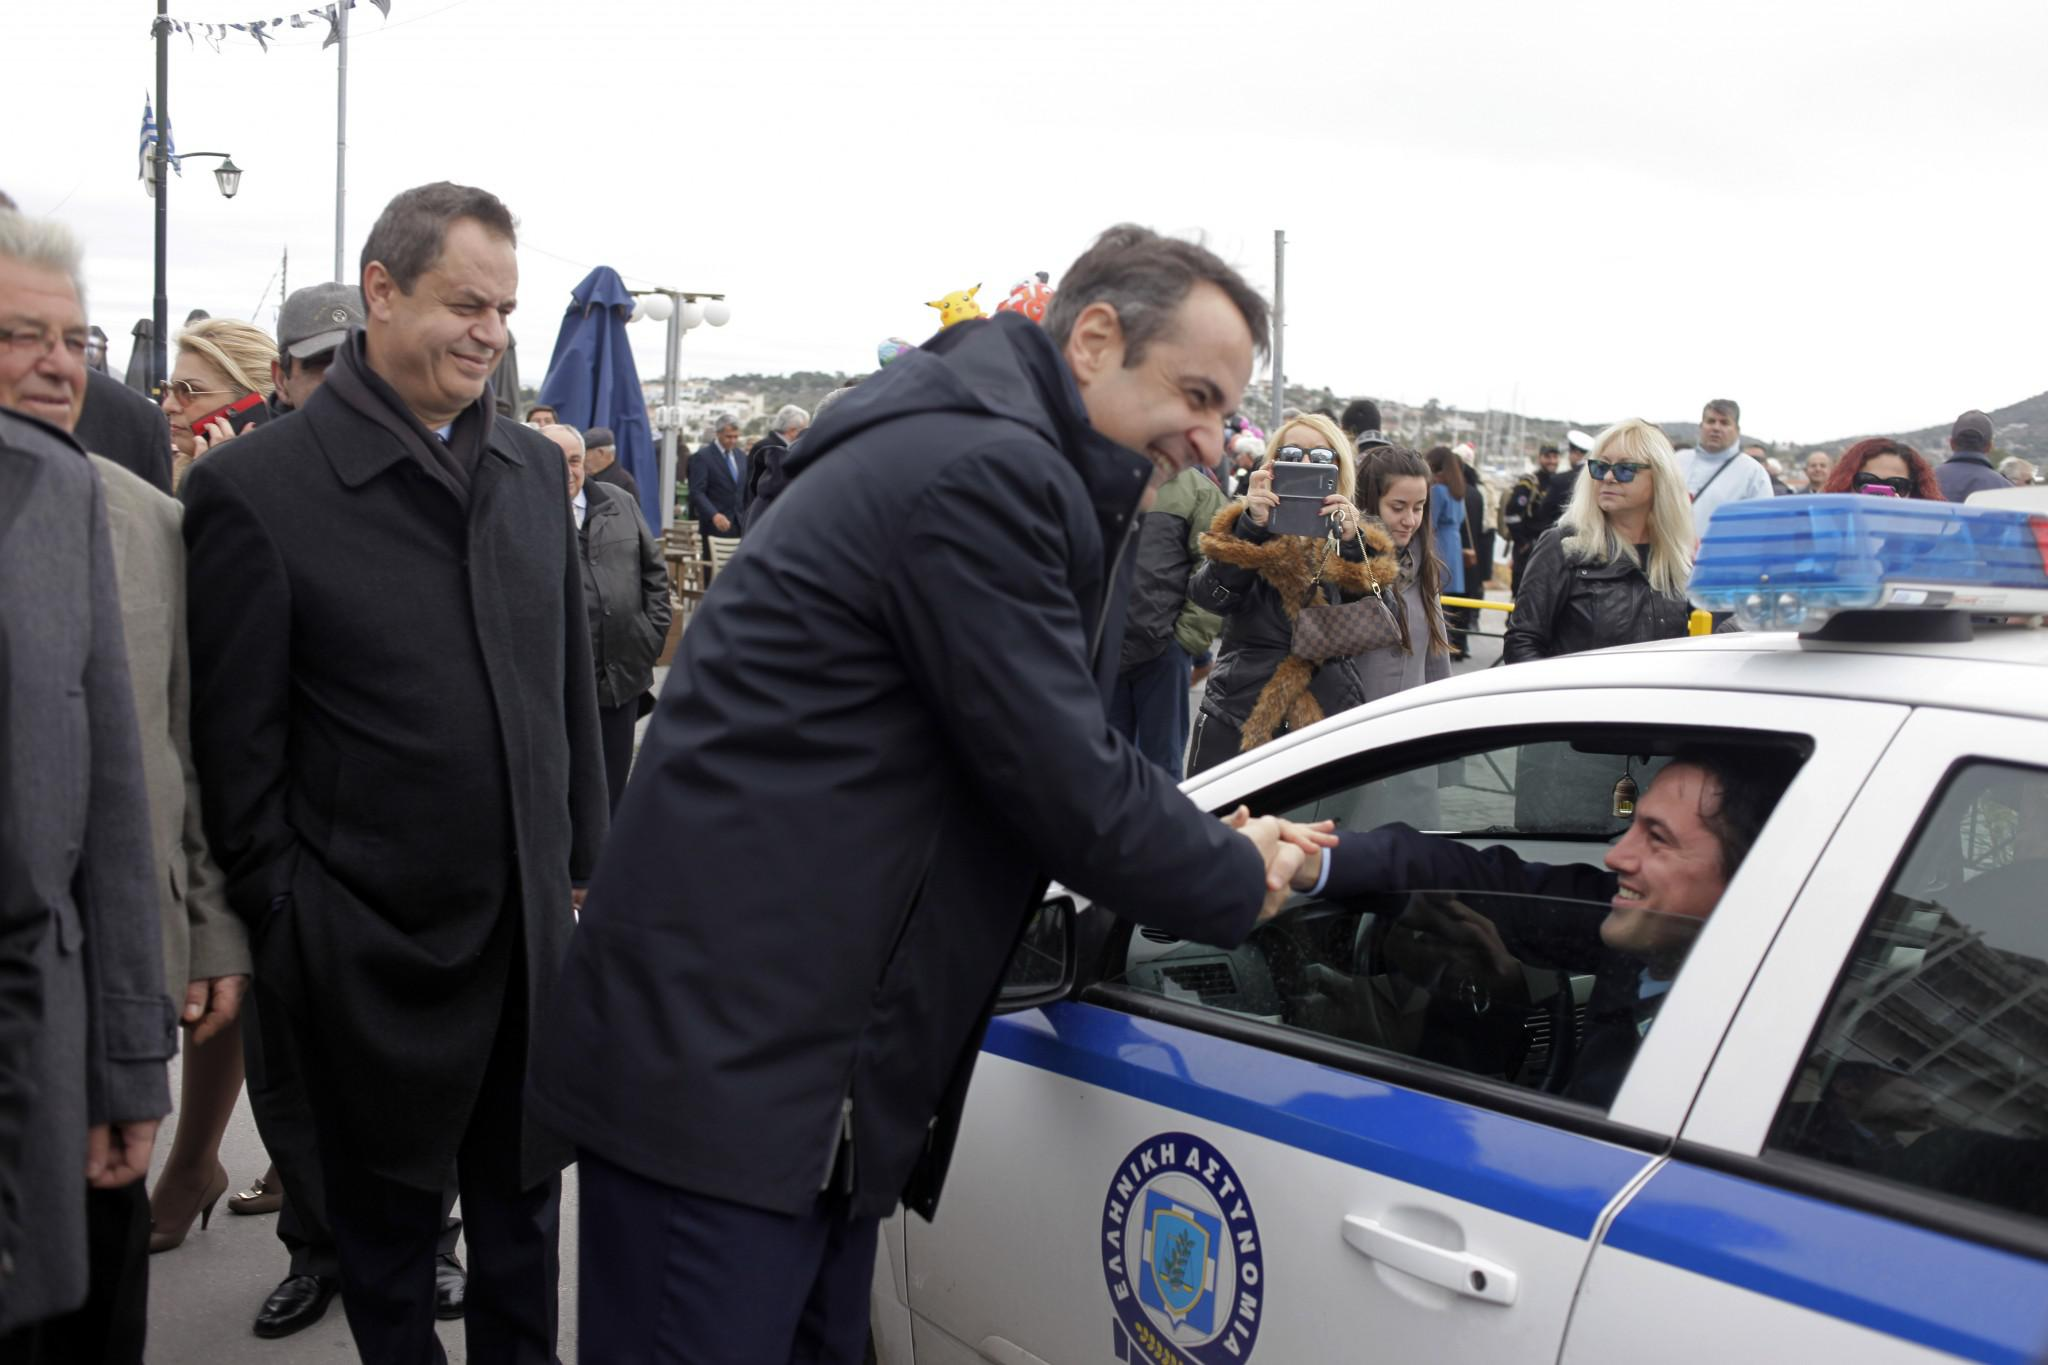 mitsotakis8-500 Μητσοτάκης: Είναι άμεση η ανάγκη για ενότητα [εικόνες]